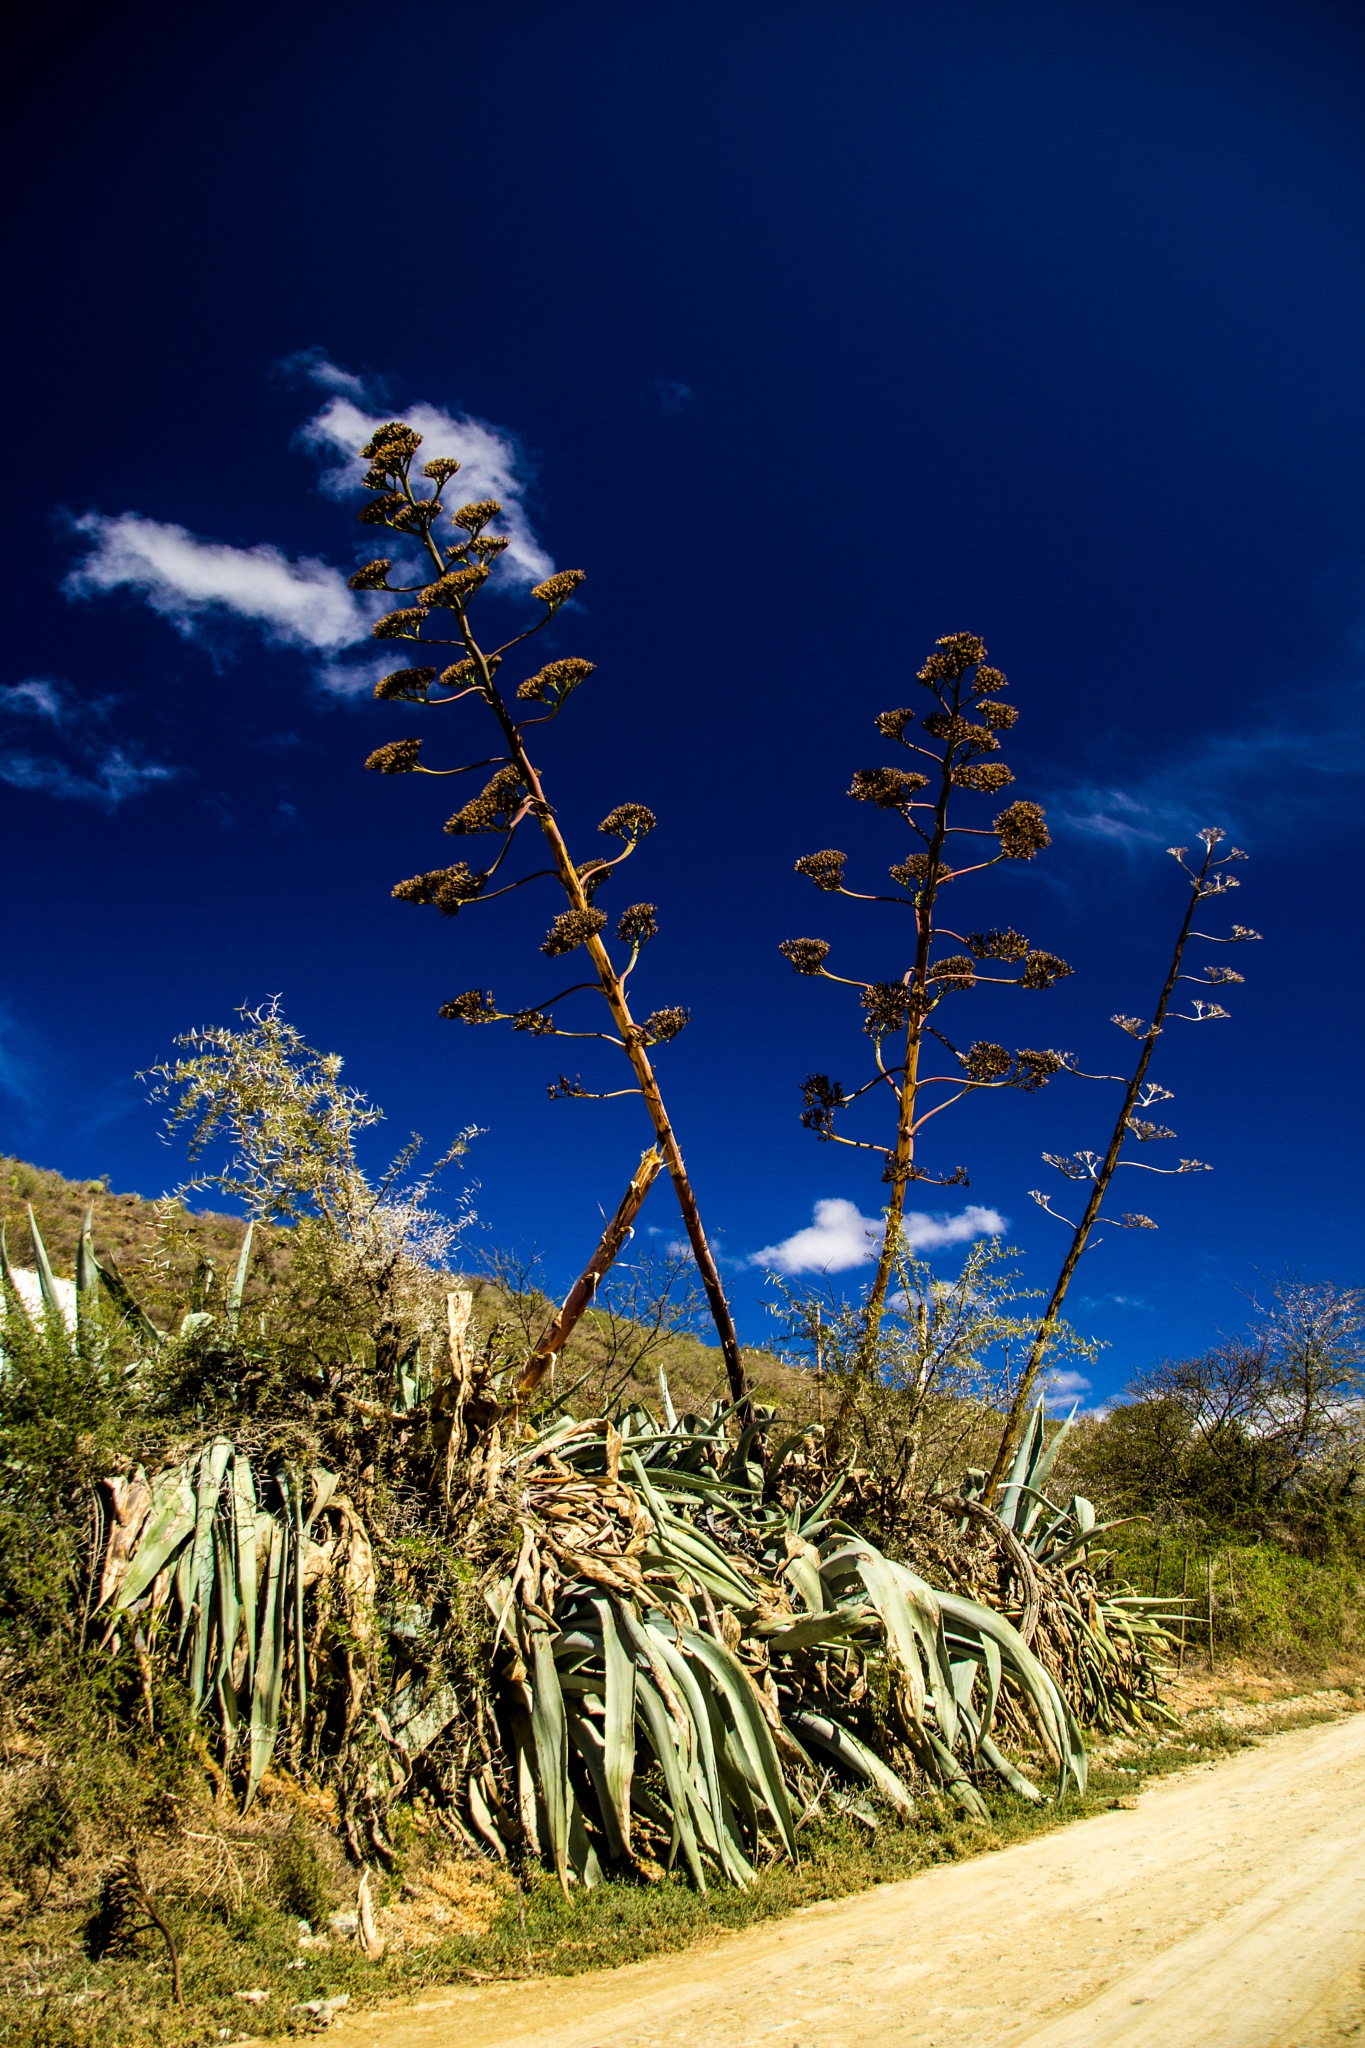 Agave sisalana - the sisal plant by Nauta Piscatorque